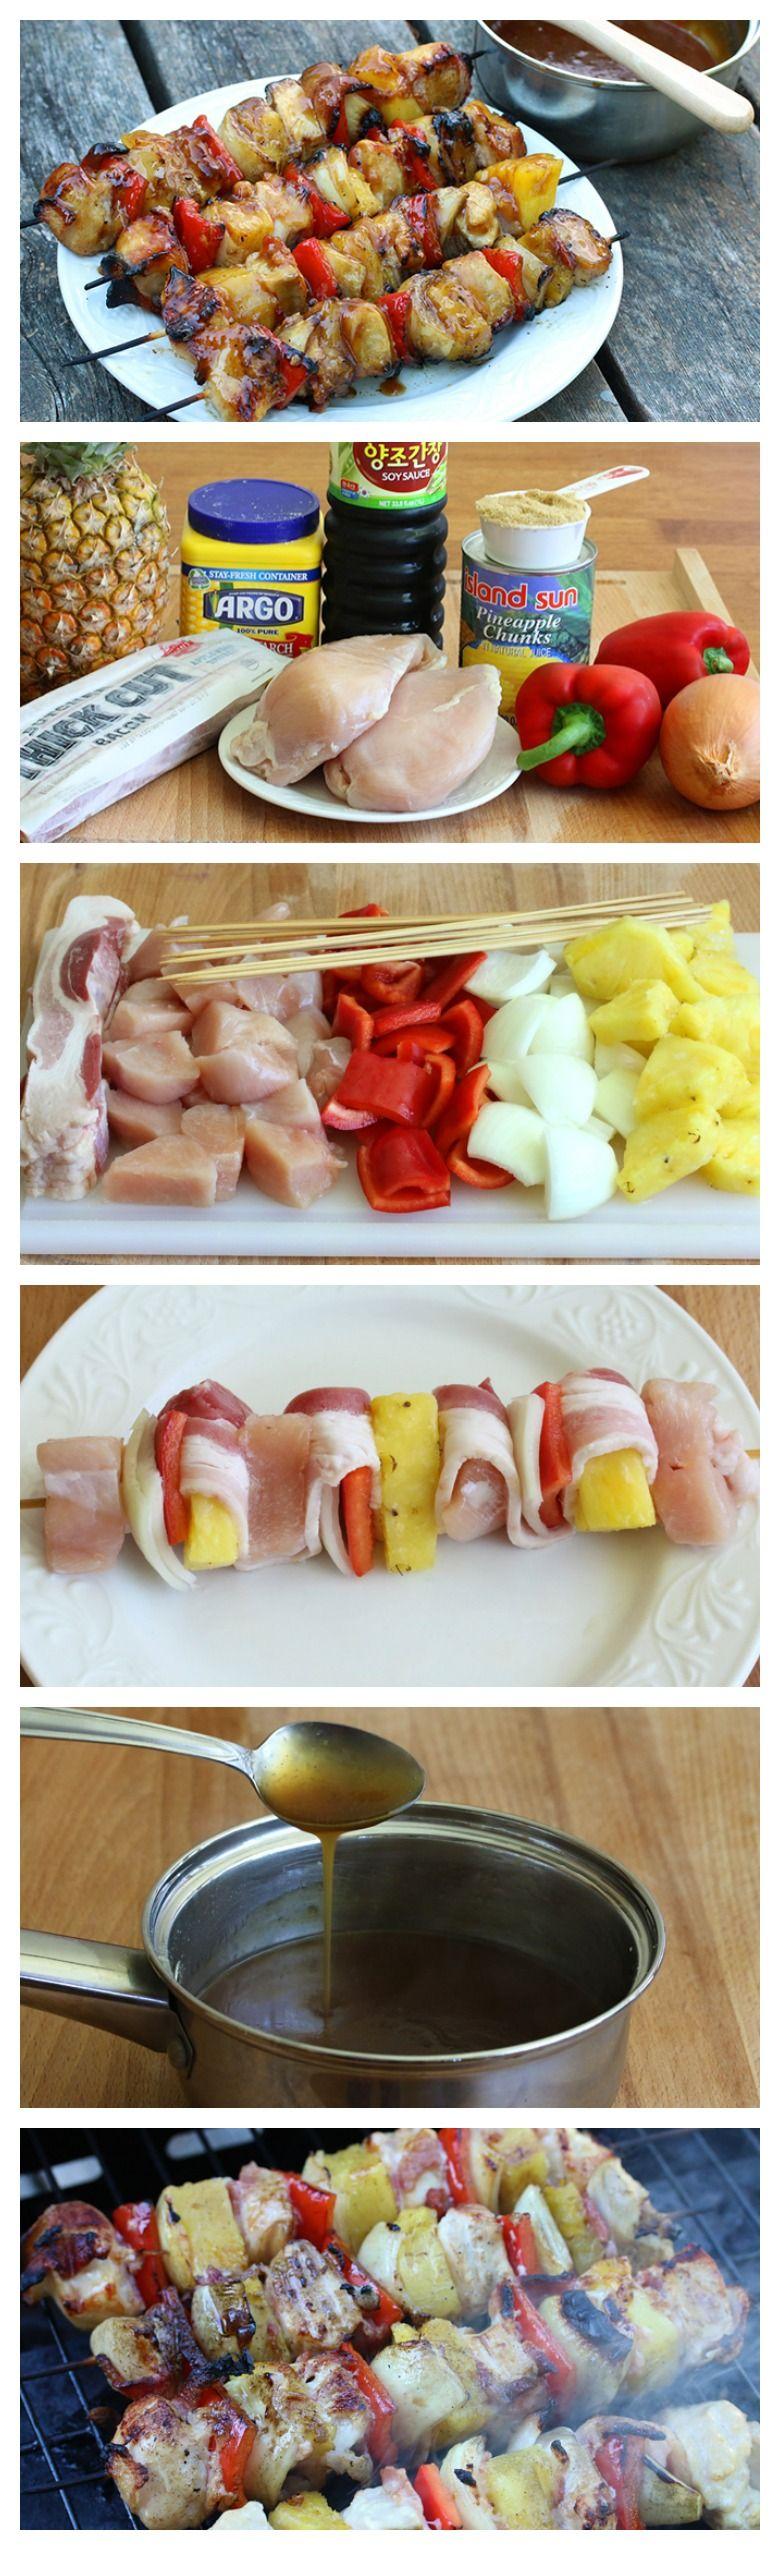 Pinchos dulces. Ingredientes: Tocineta, pollo, pimentones, piña, salsa de soya, salsa barbecue.